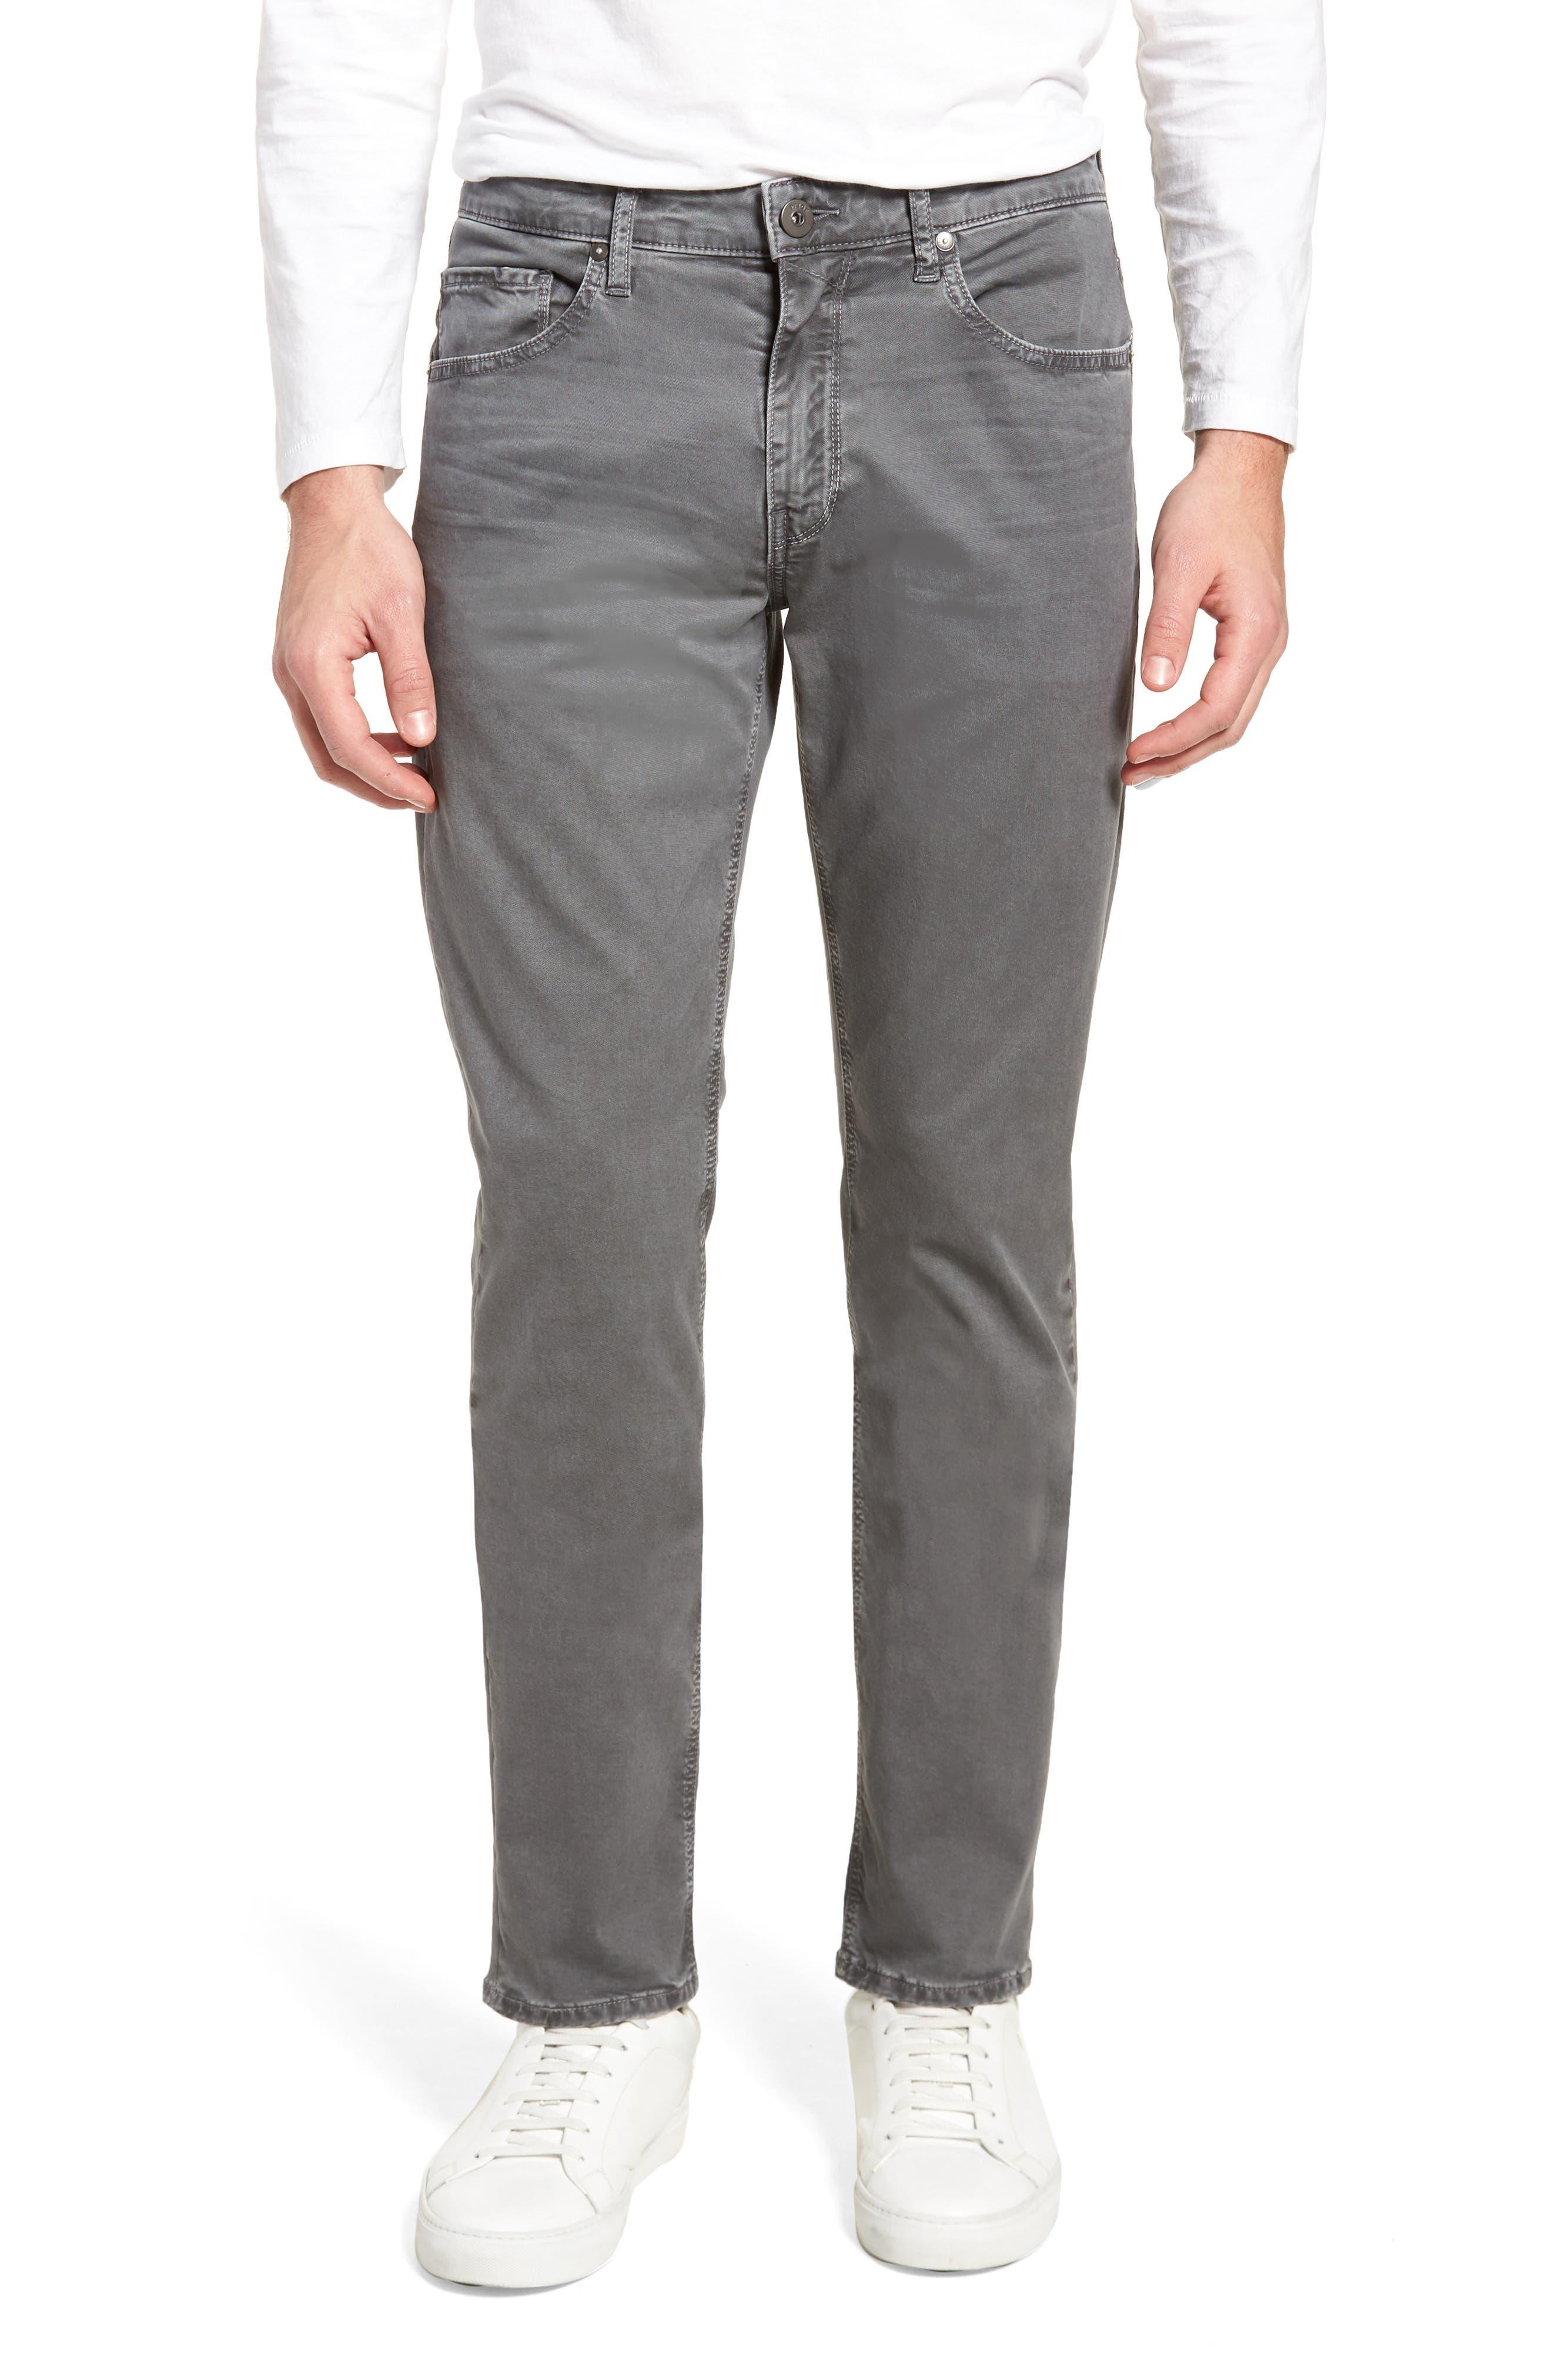 Lennox Slim Fit Five-Pocket Pants,                             Main thumbnail 1, color,                             VINTAGE THUNDER GREY